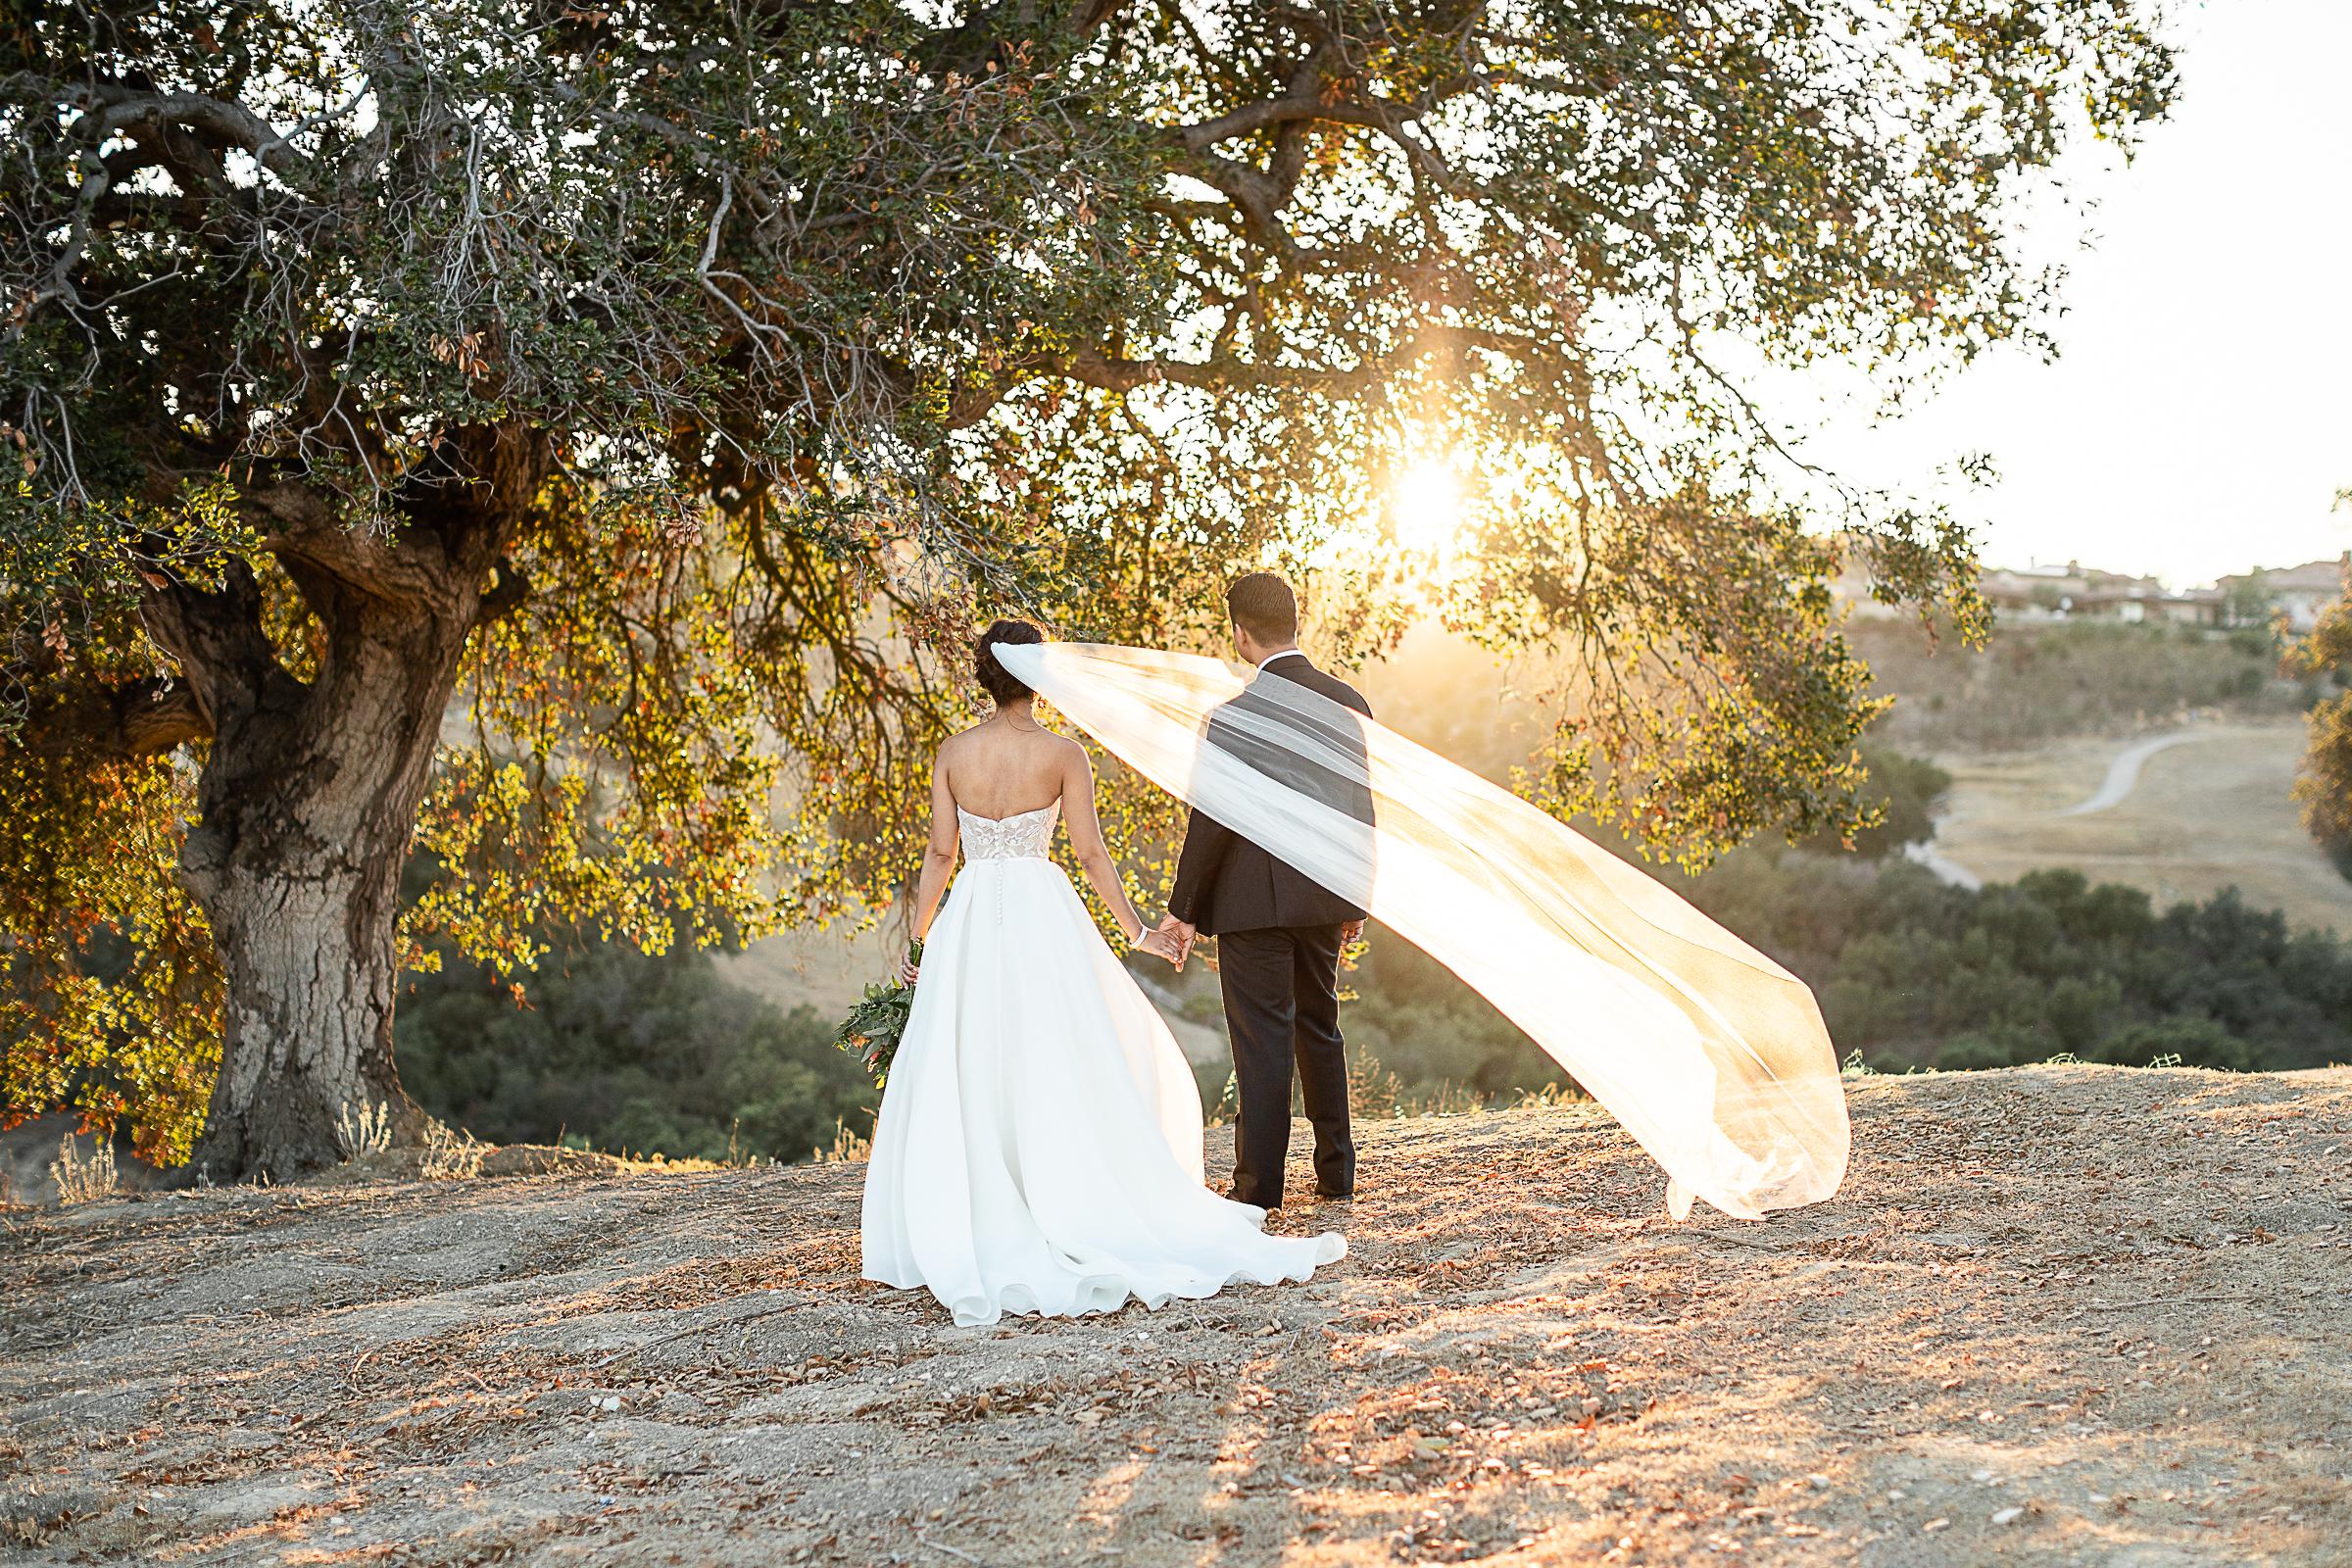 Medina and Arash's Vellano Country Club Wedding, Chino Hills-31.jpg